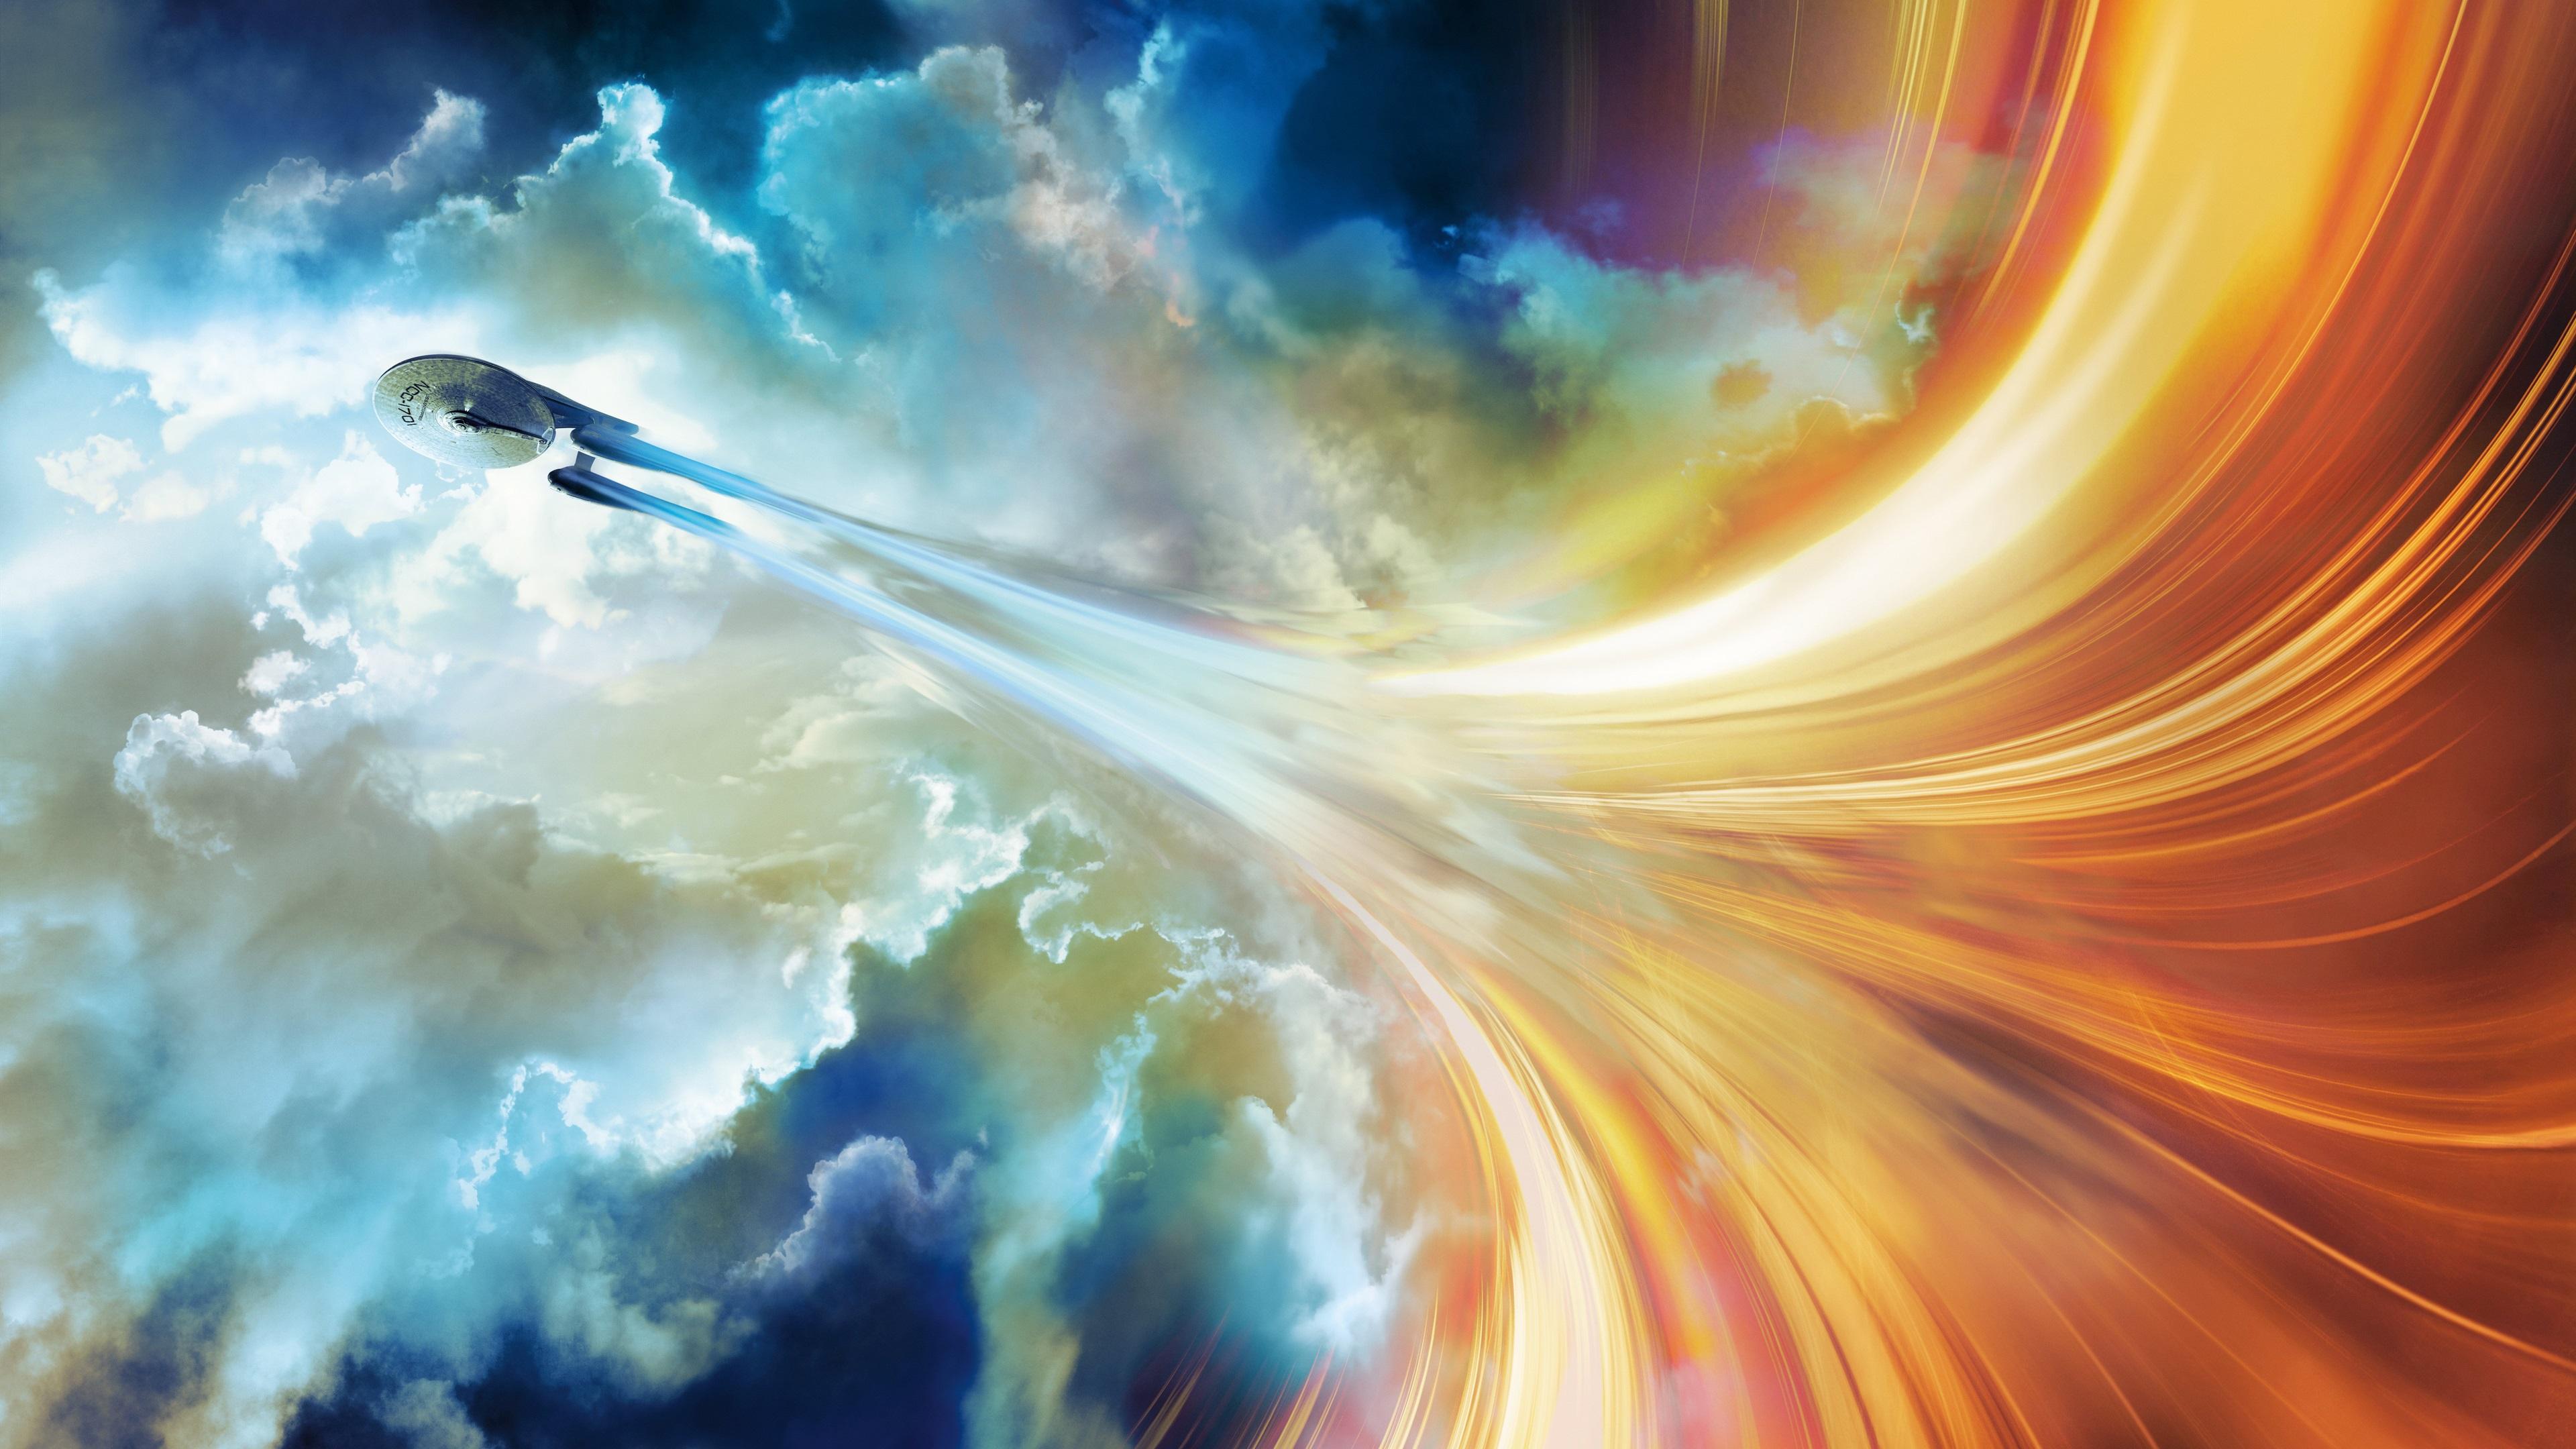 Star Trek 220 Ber 2016 Film Hintergrundbilder 3840x2160 Uhd